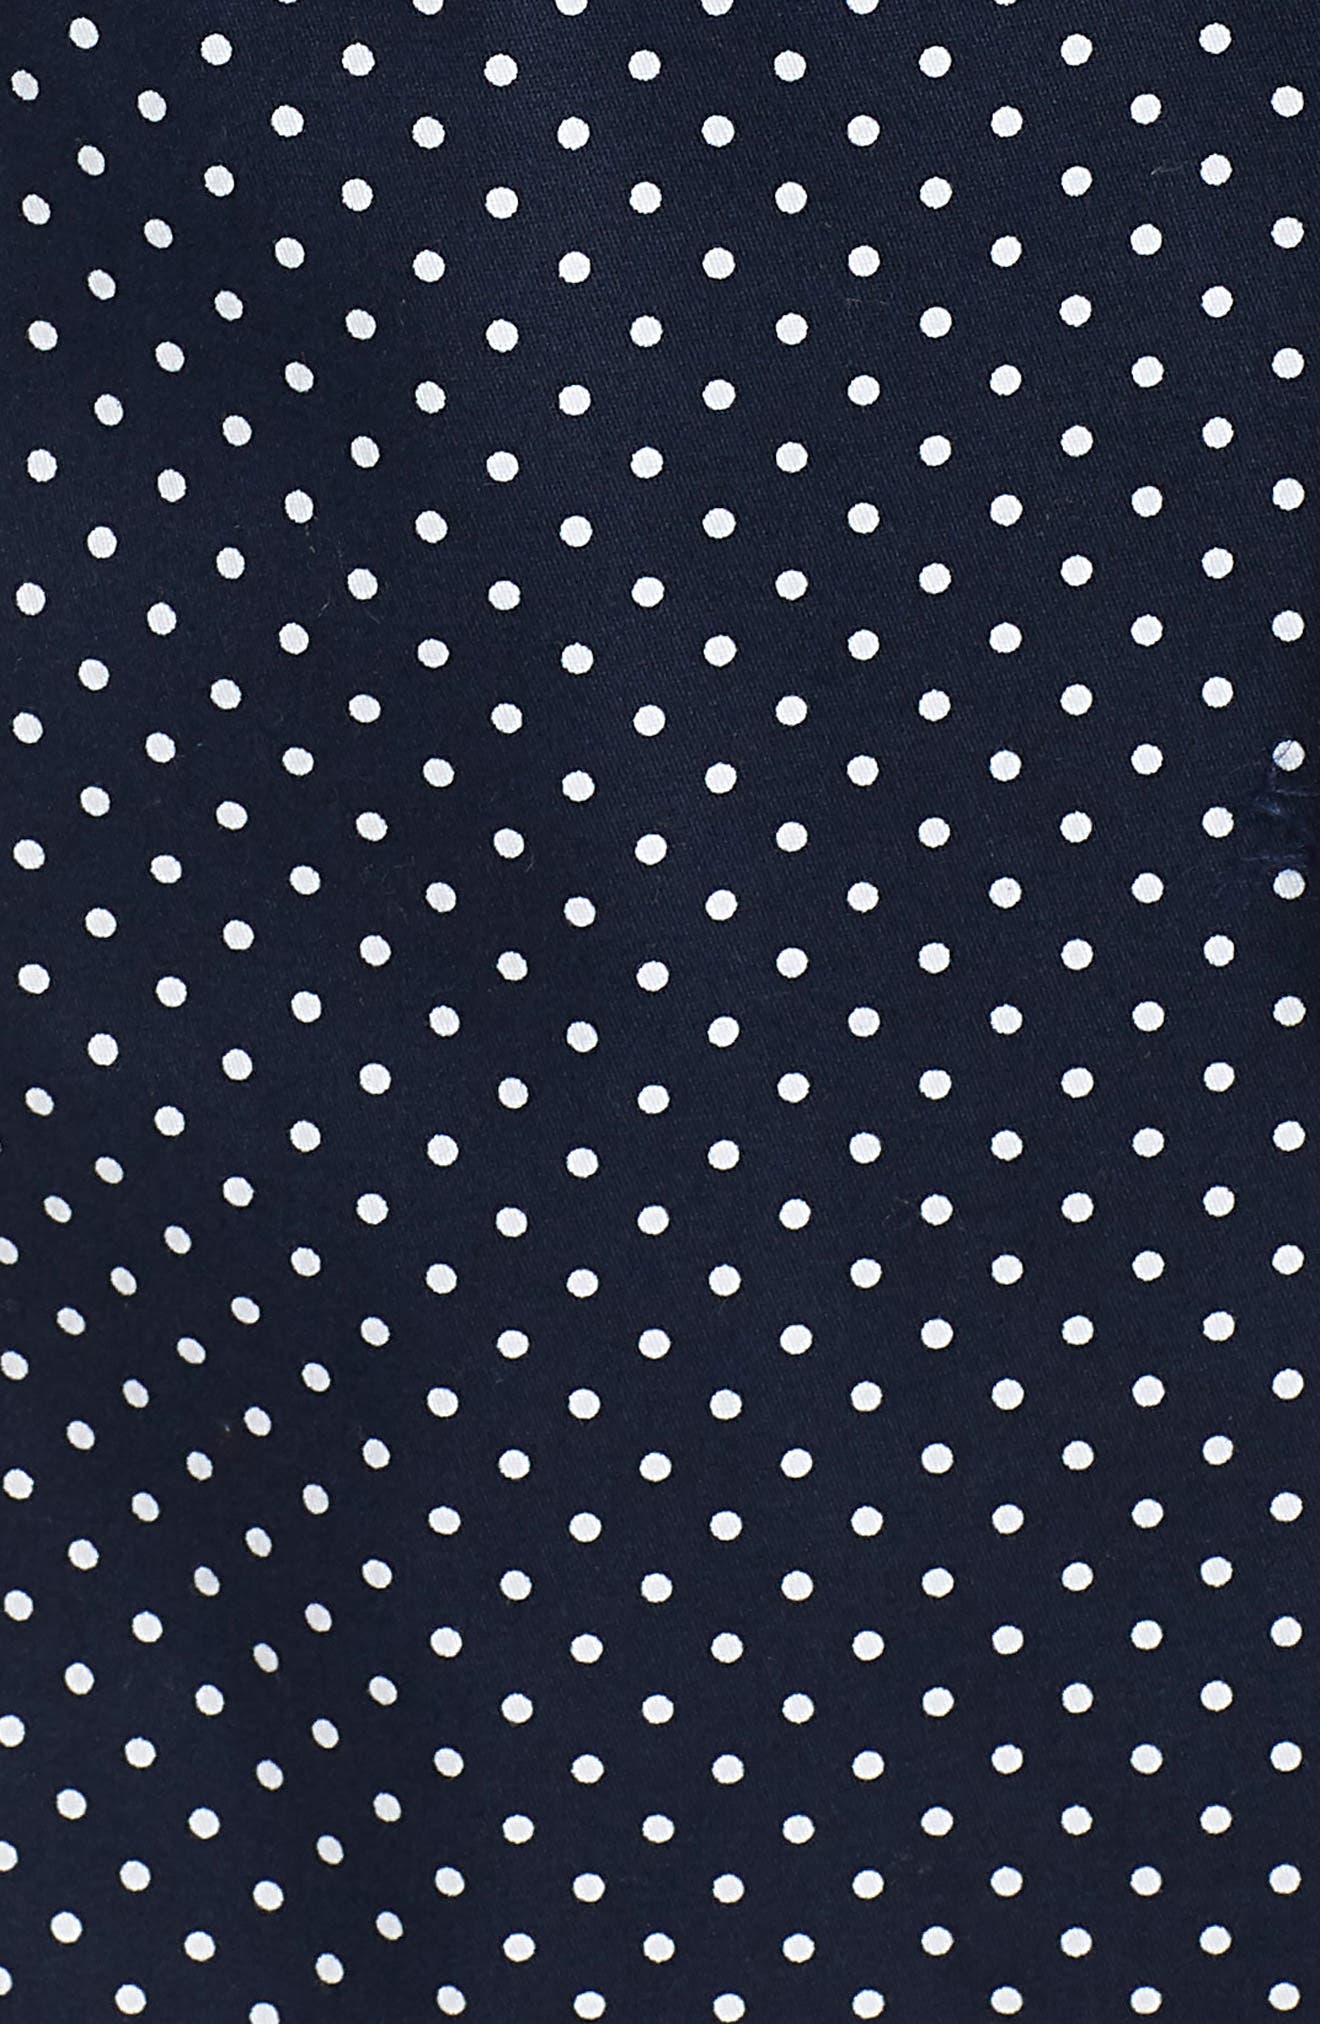 Polka Dot Single Breasted Trench Coat,                             Alternate thumbnail 6, color,                             Navy